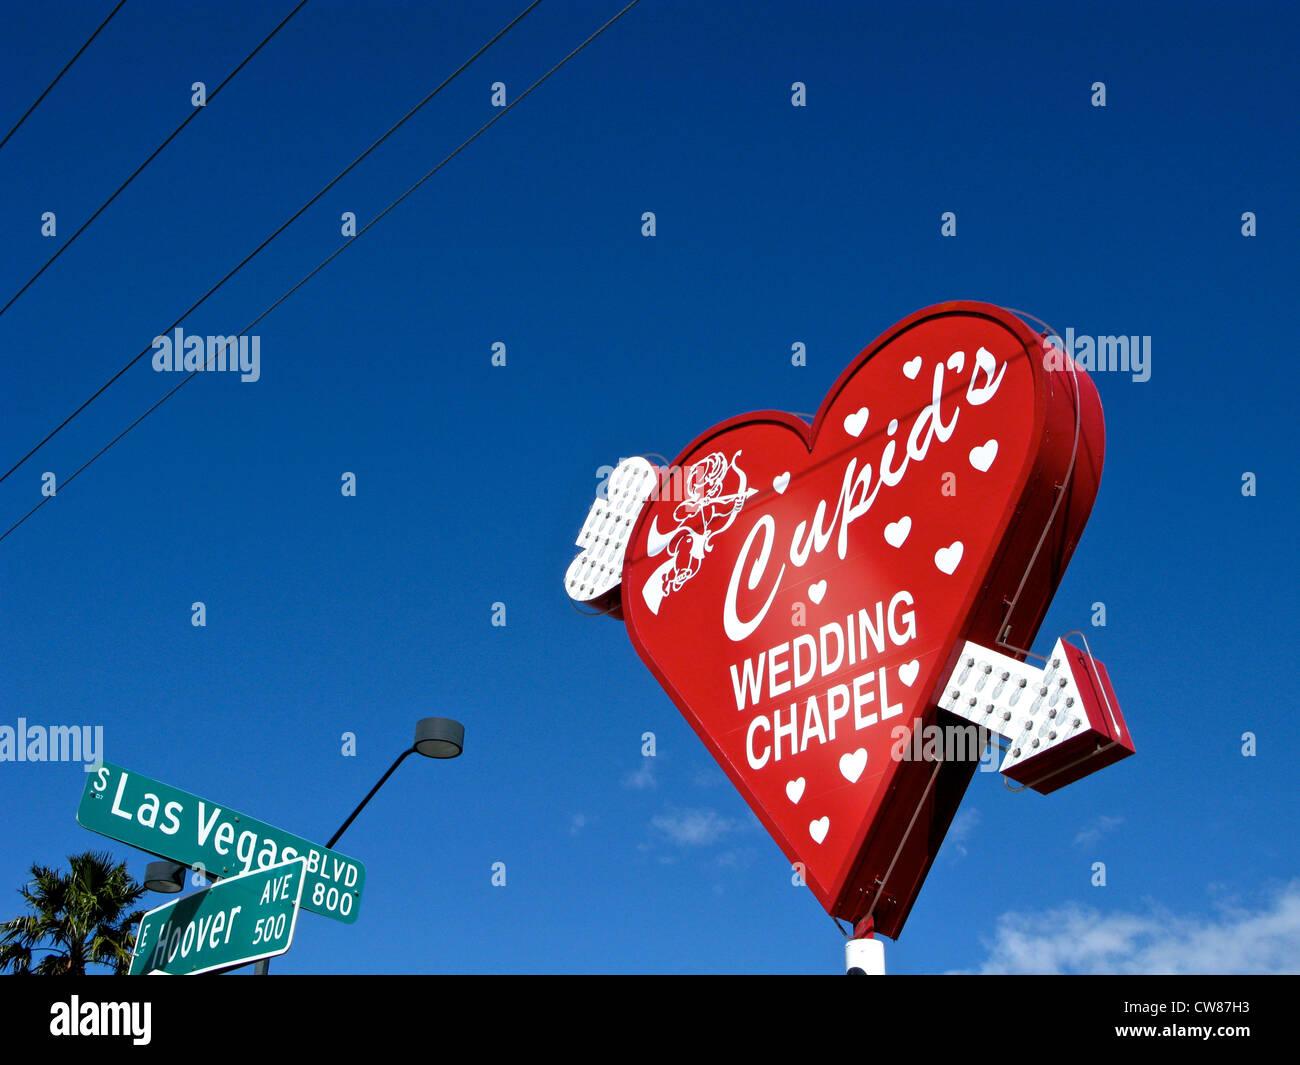 Amor Hochzeit Kapelle roten Herzschild Neon Pfeil Las Vegas Blvd & Hoover Ave Straßenschilder Las Vegas Nevada, Stockfoto